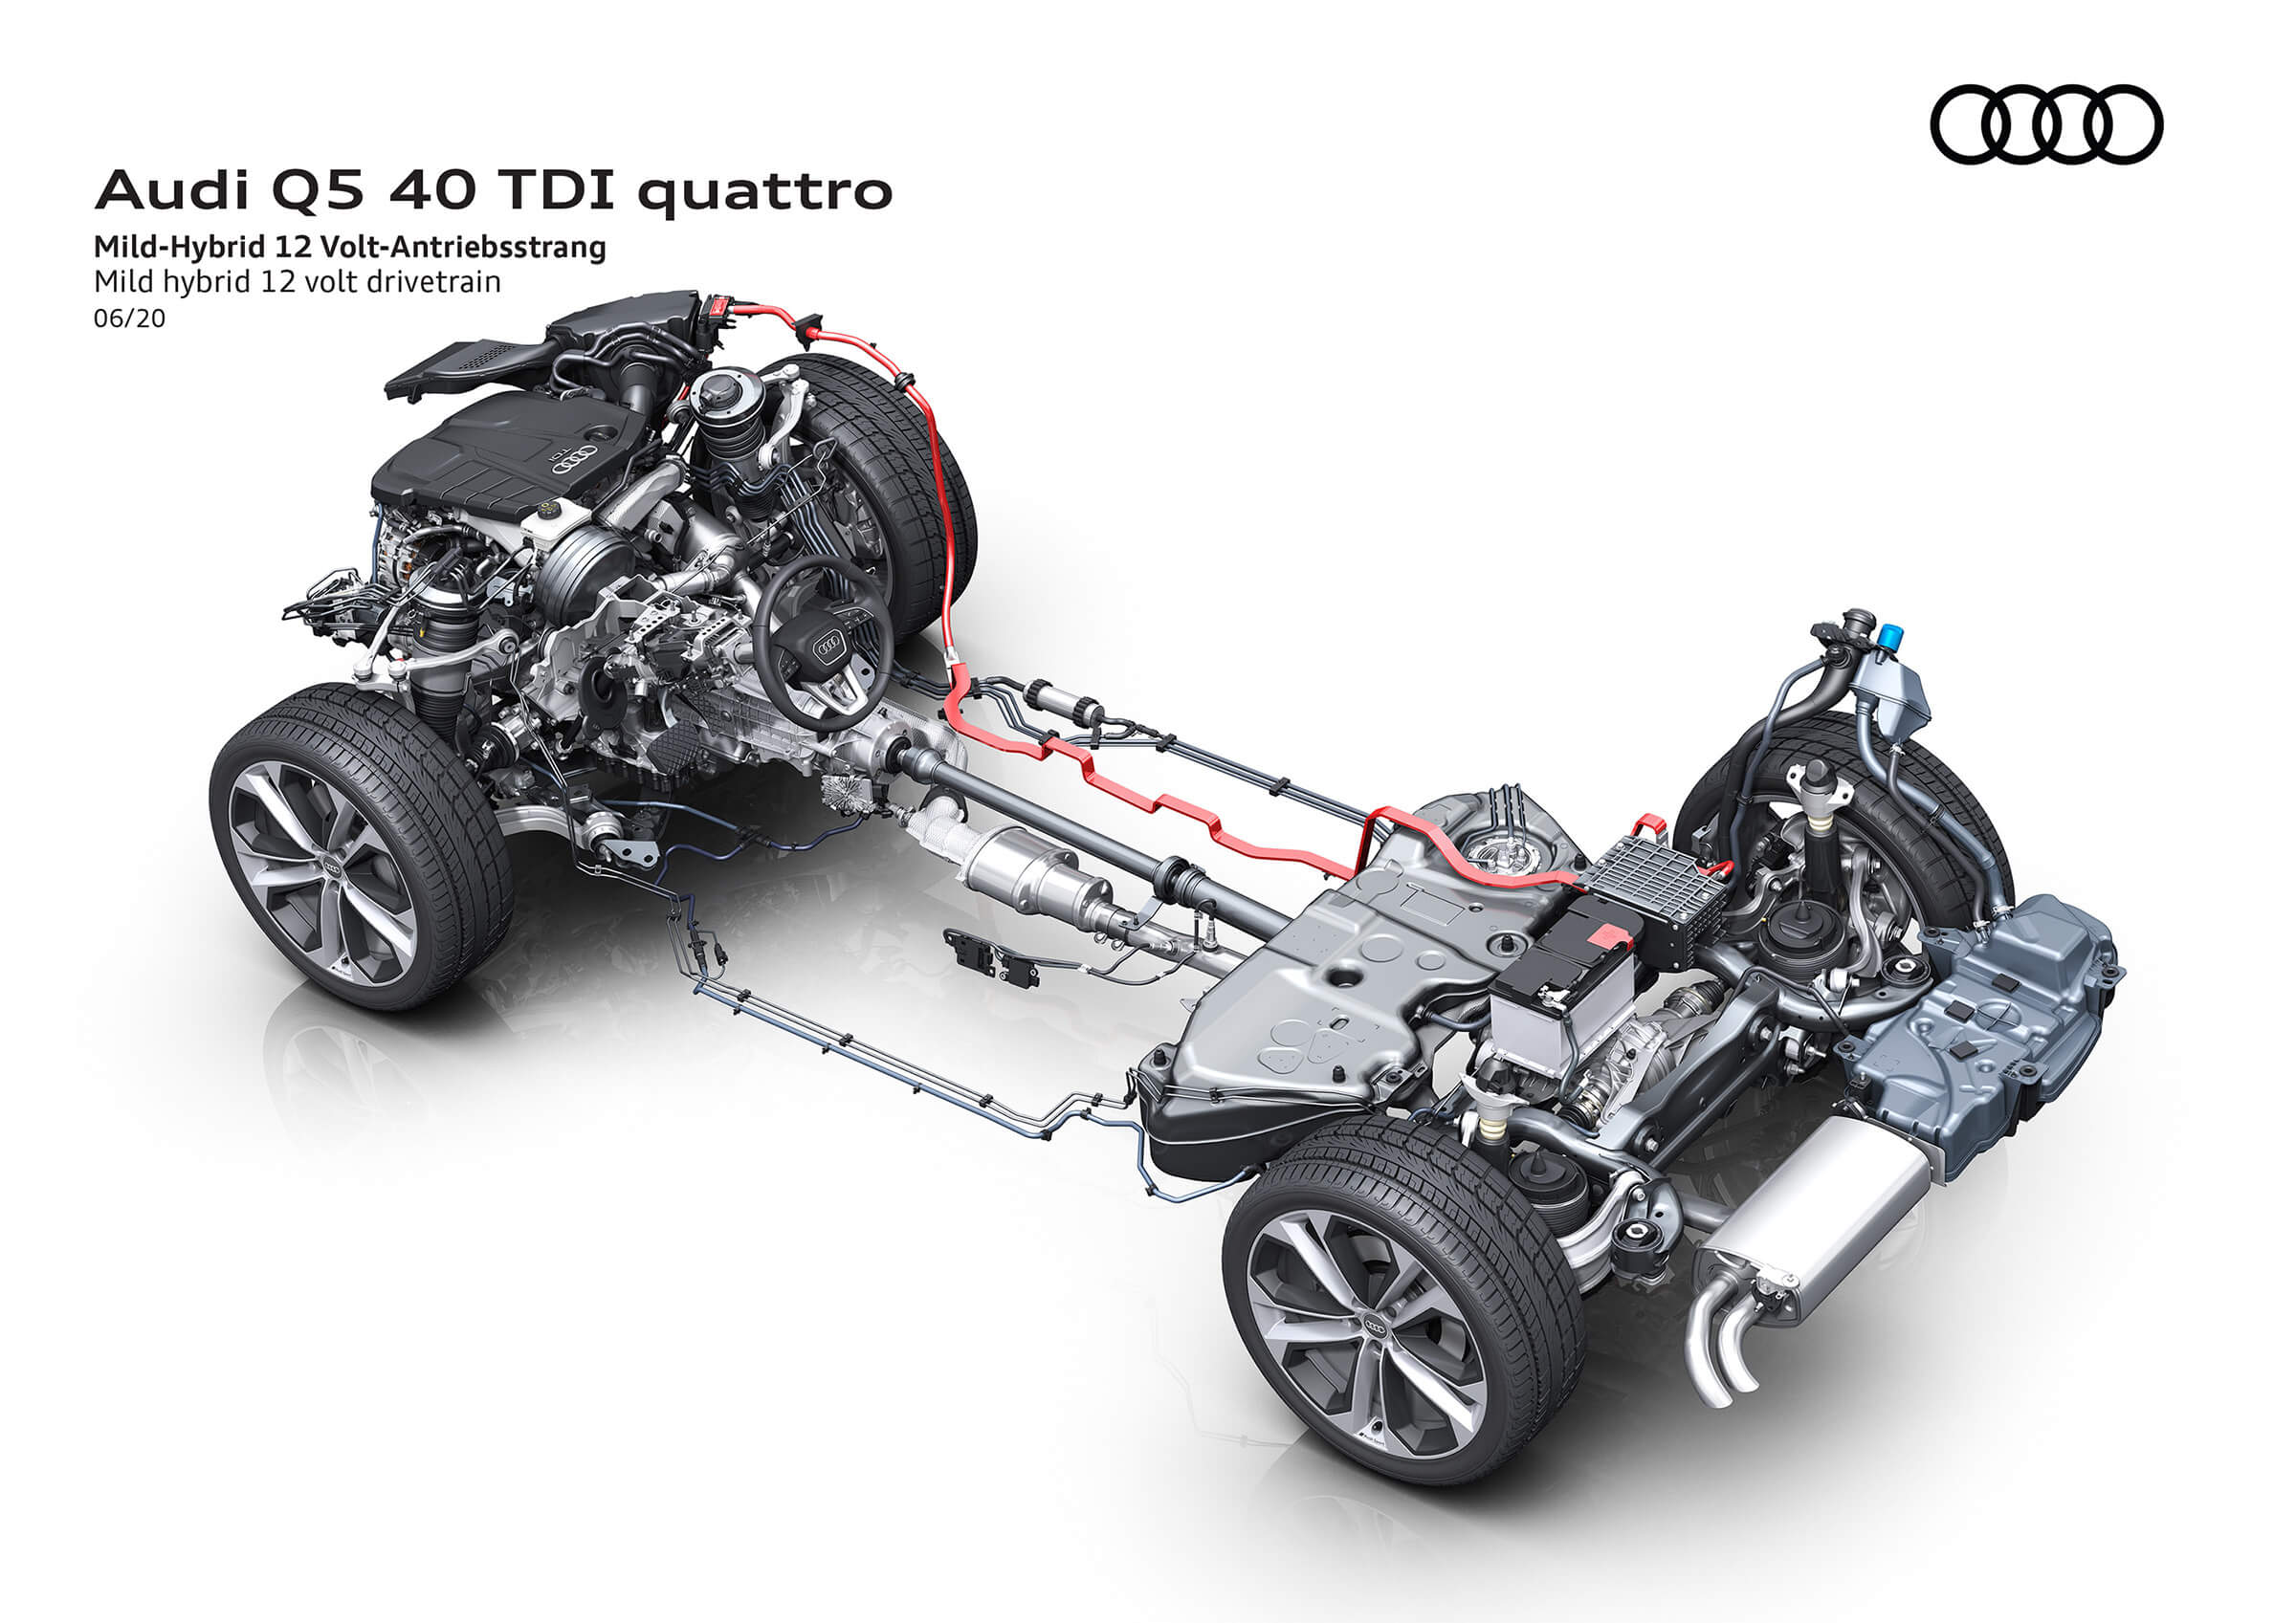 Audi Q5 - Ήπιο υβριδικό σύστημα (MHEV) 12 Volt